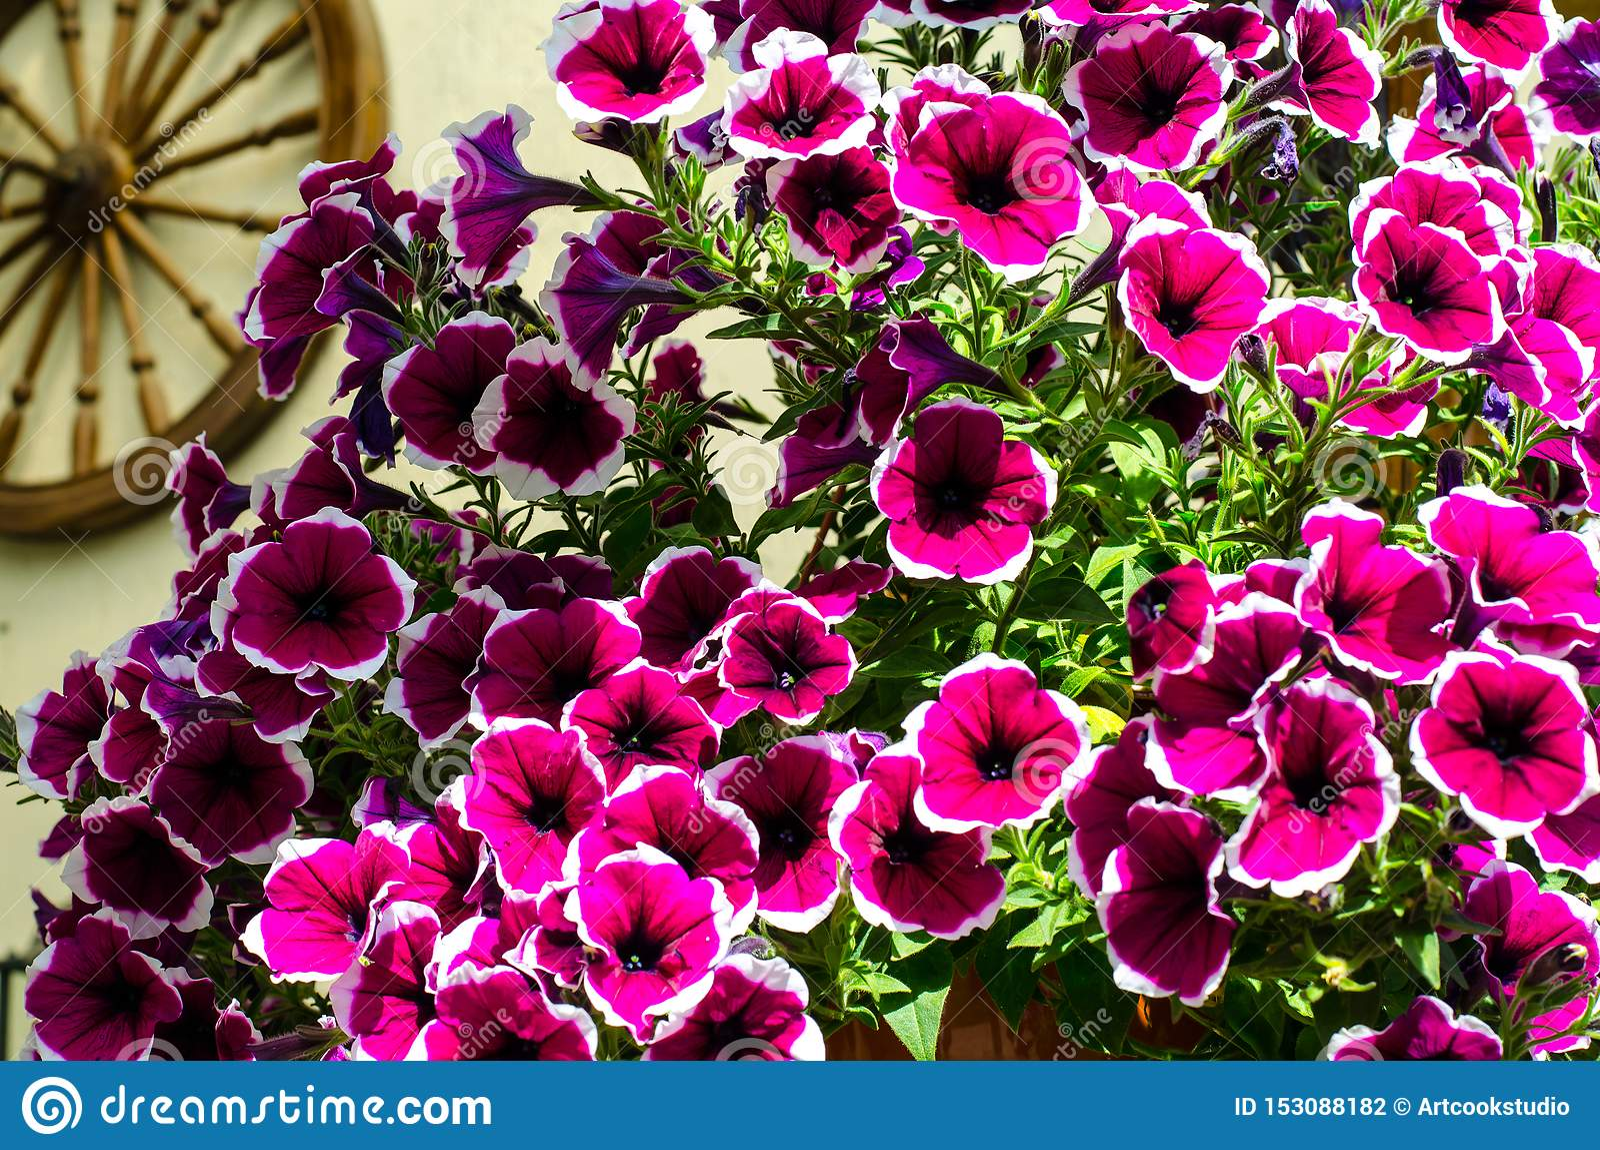 Flowering Petunia In Garden Landscape Design Stock Photo Image